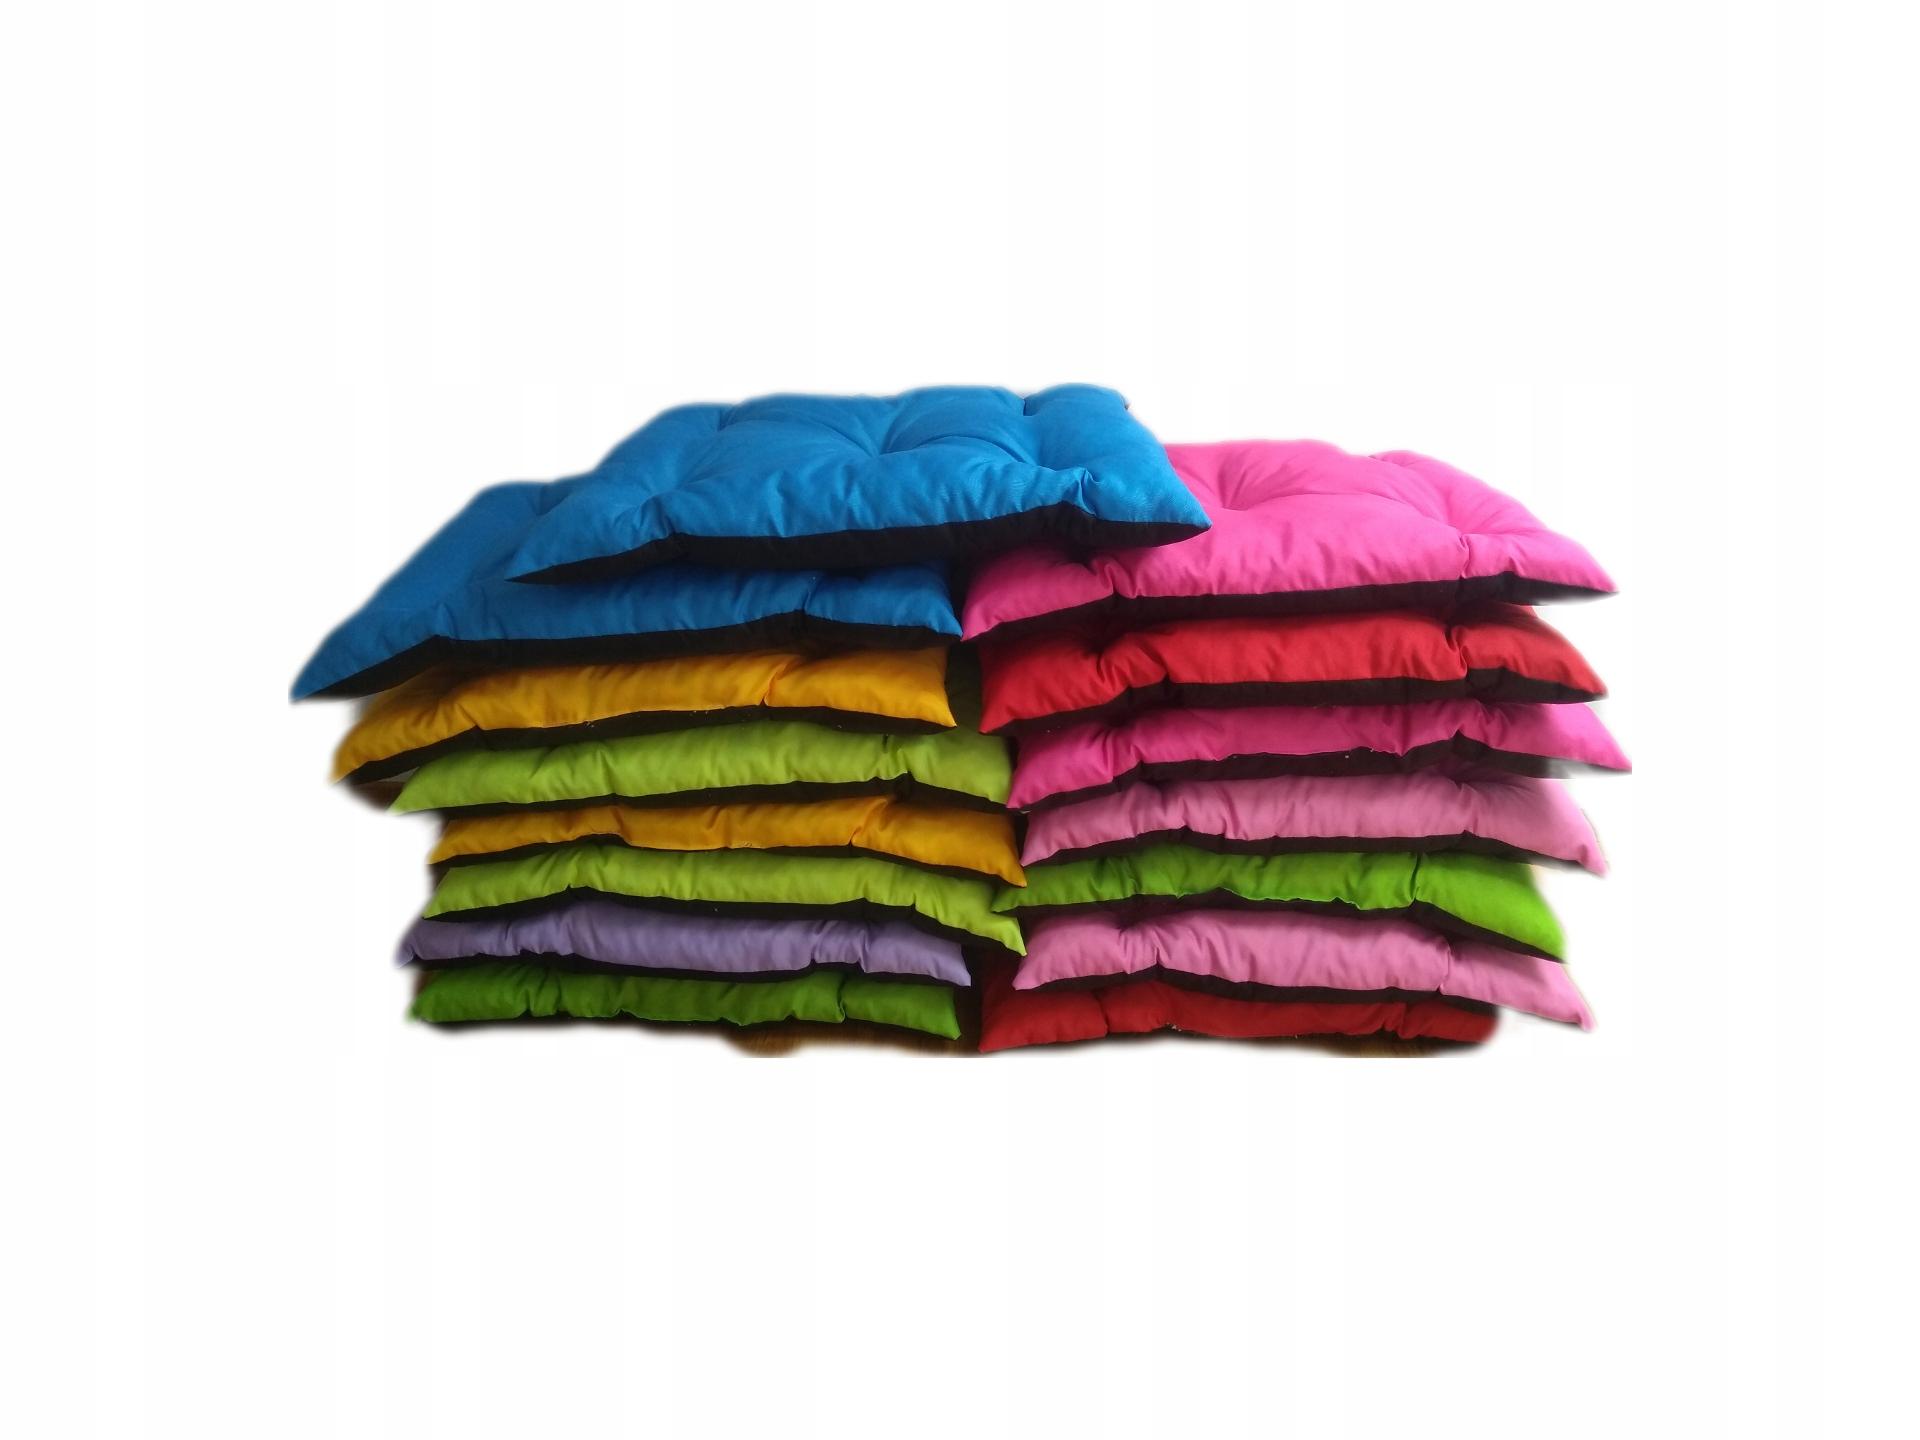 Подушка для Собаки / Кошки 80x115 + ИМЯ БЕСПЛАТНО